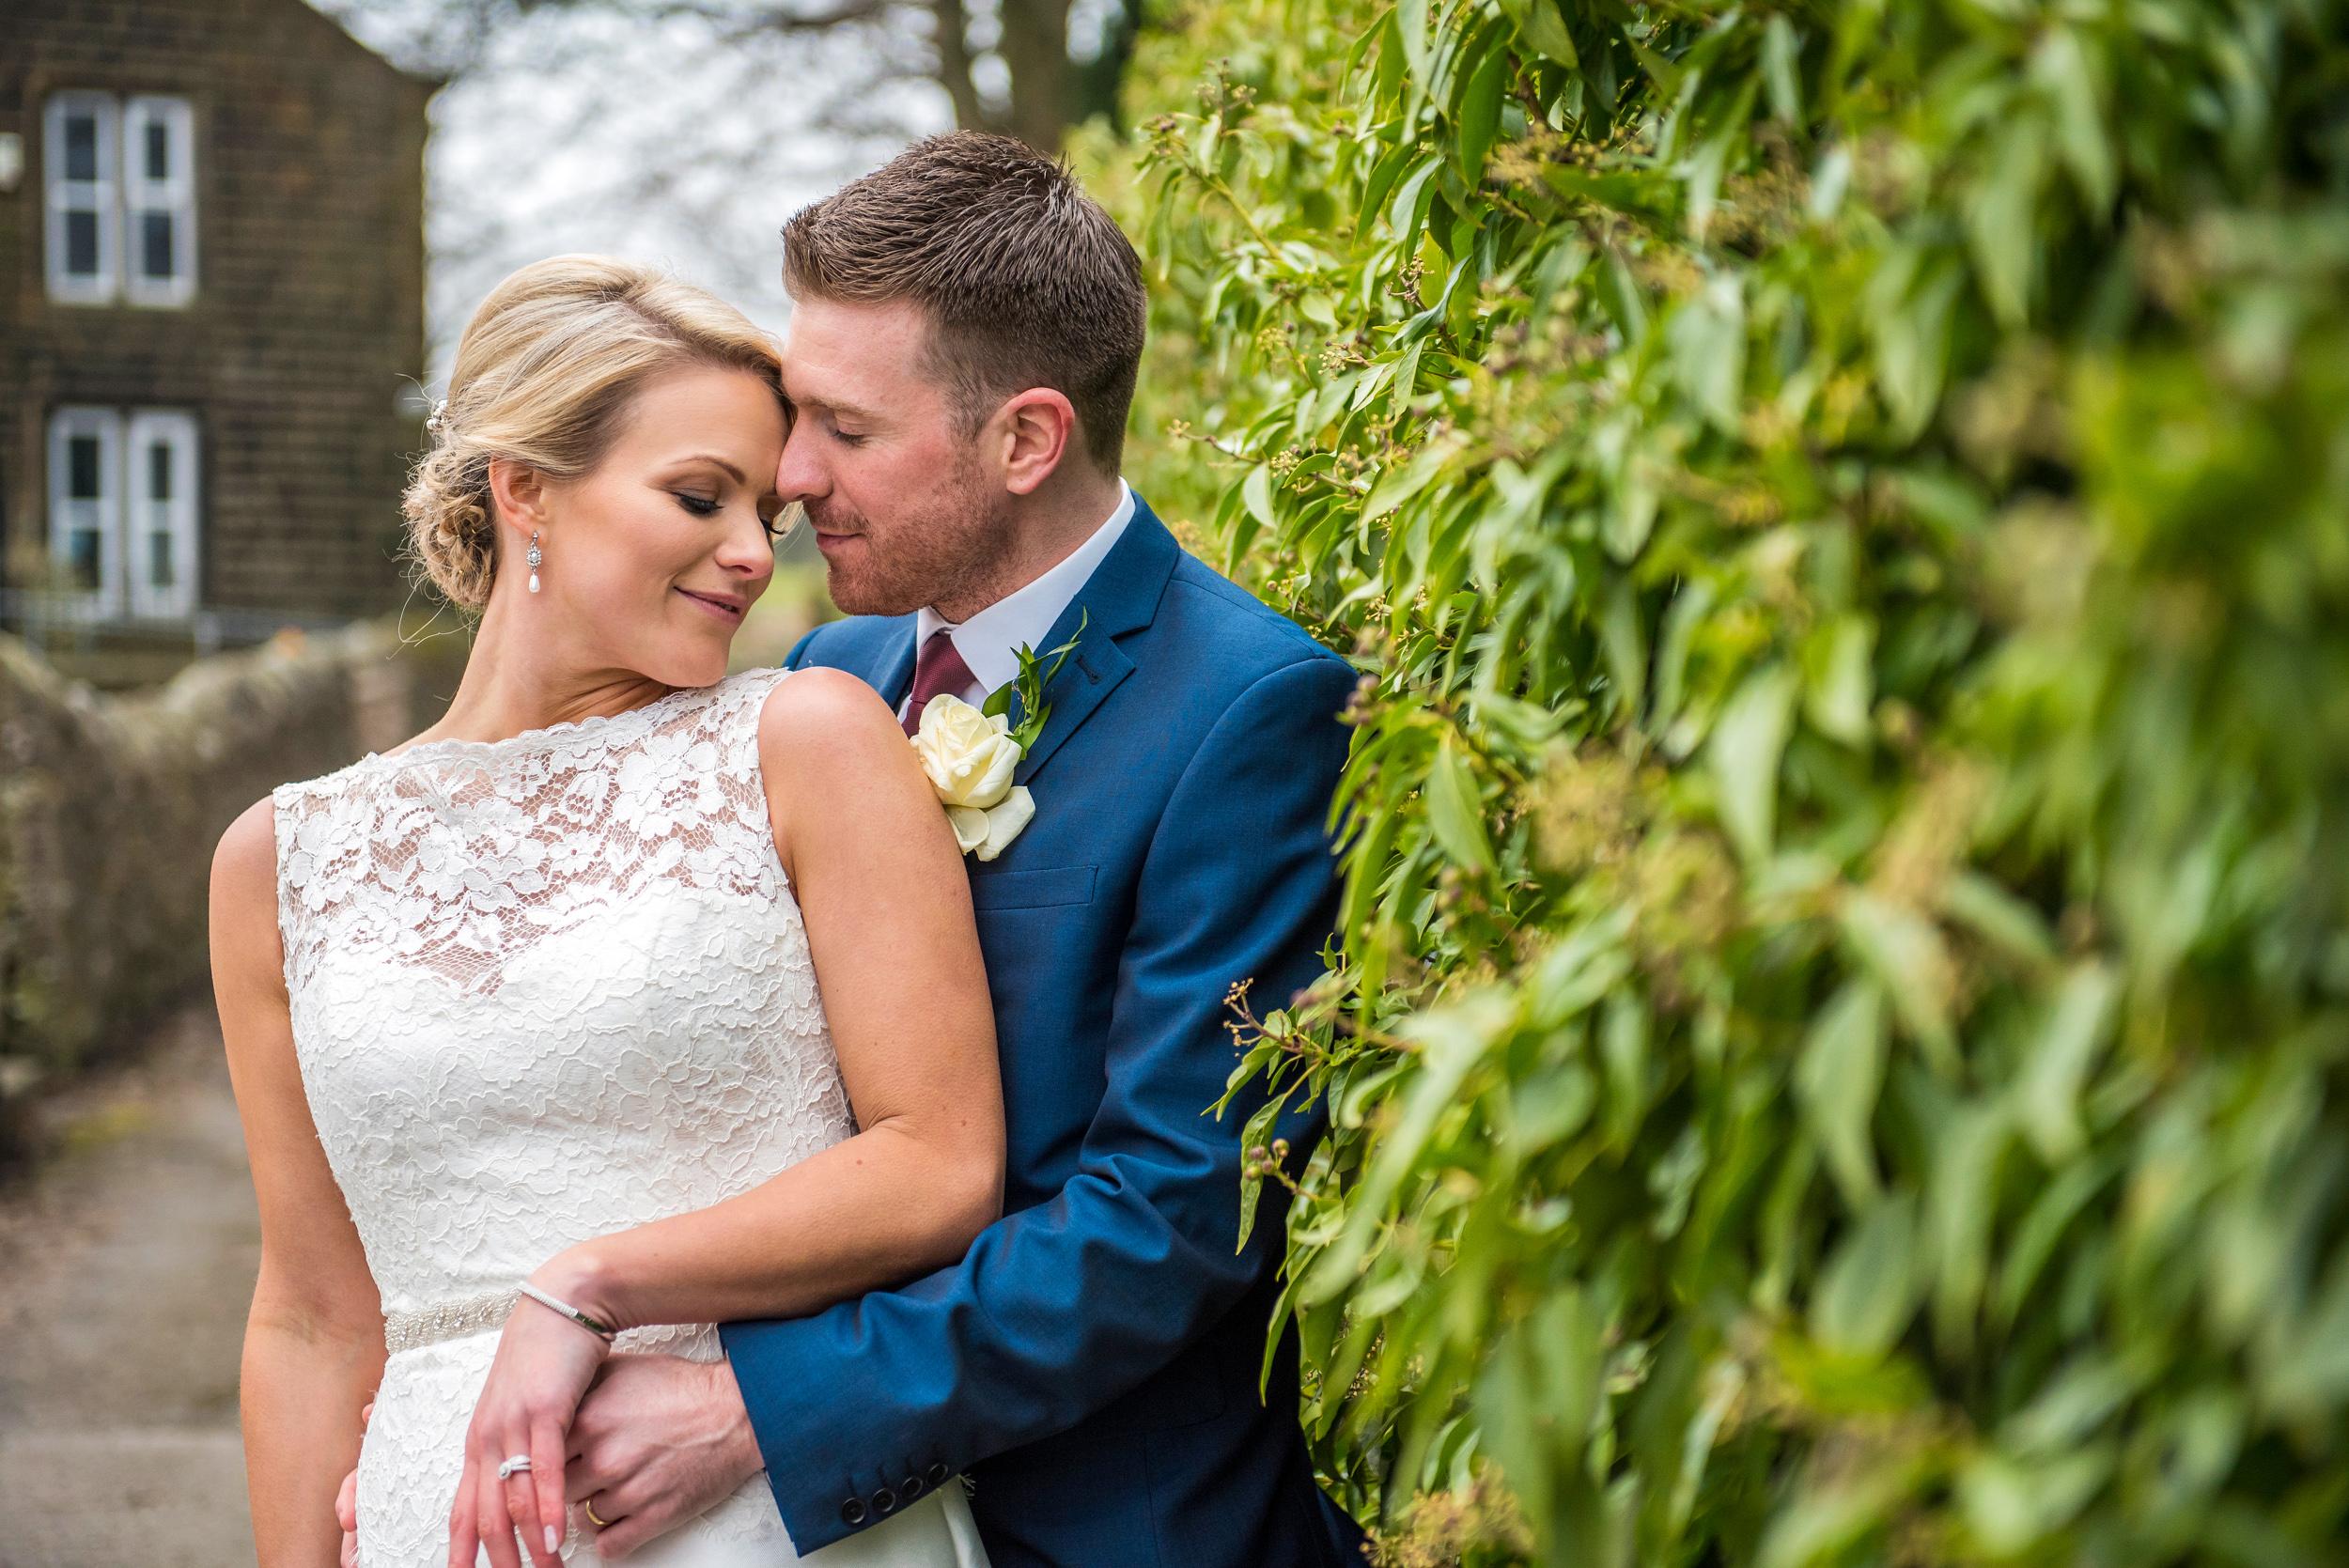 David Scholes Lancashire wedding photography 2016-36.jpg